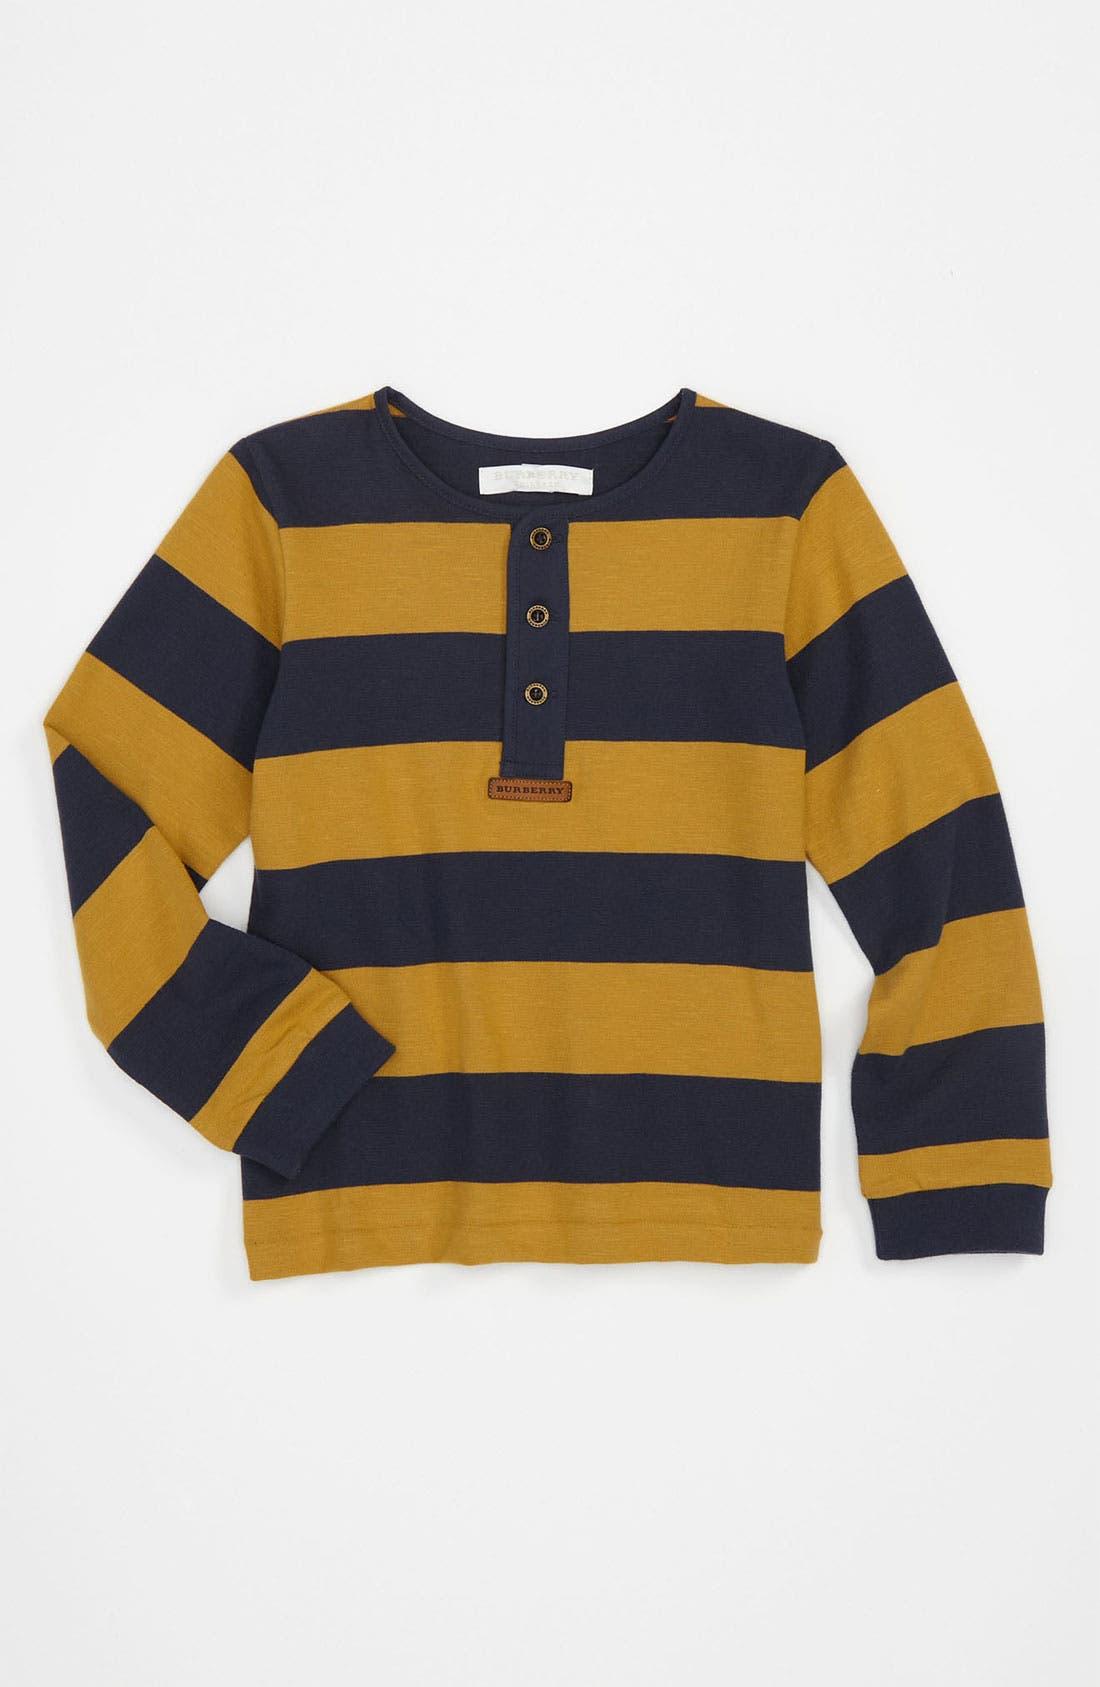 Alternate Image 1 Selected - Burberry Knit Shirt (Toddler)